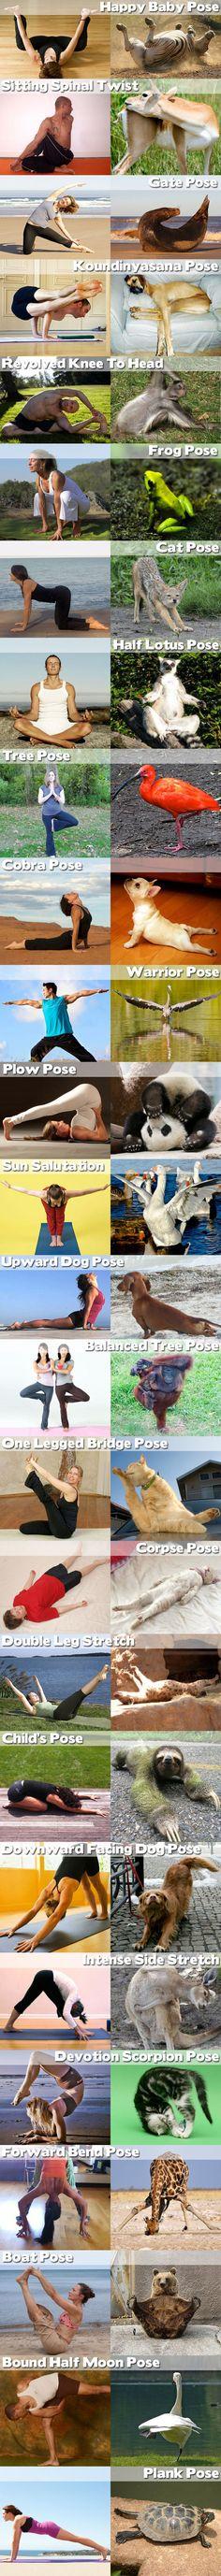 Funny Animal Yoga – 28 Pics